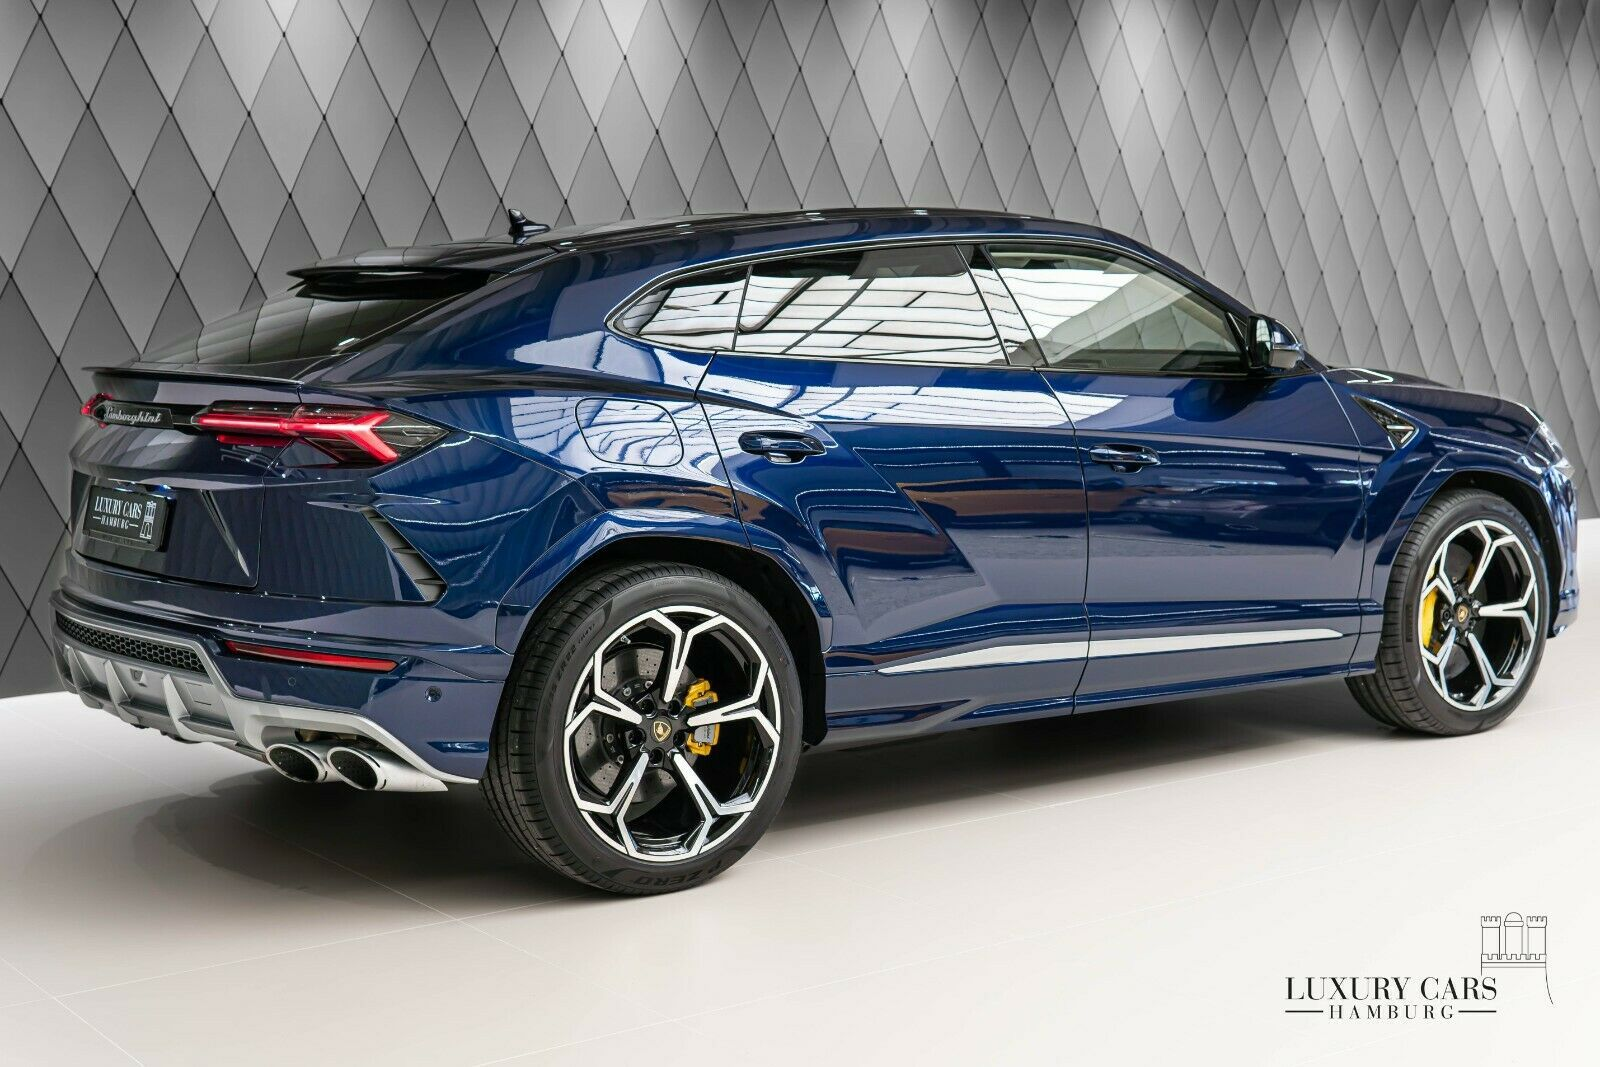 For Sale 2020 Lamborghini Urus Luxury Cars Hamburg United States For Sale On Luxurypulse Luxury Cars Luxury Suv Lamborghini